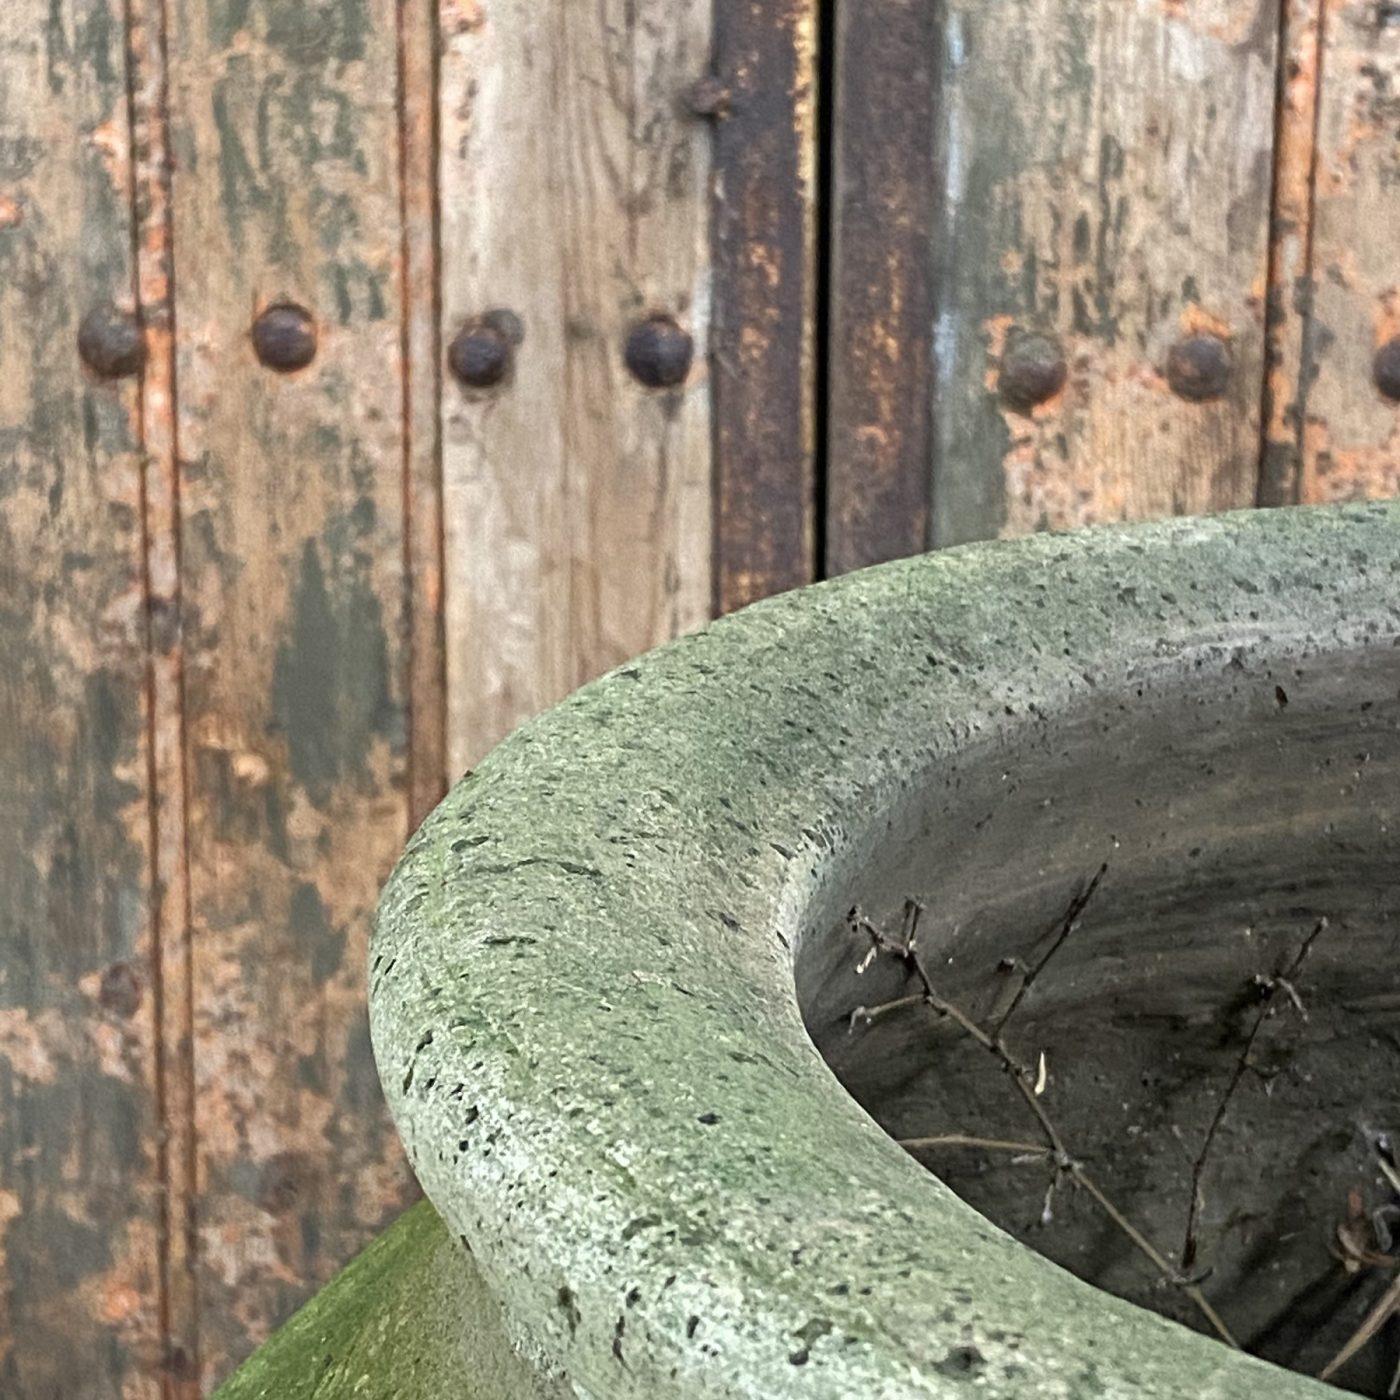 objet-vagabond-terracotta-jar0004